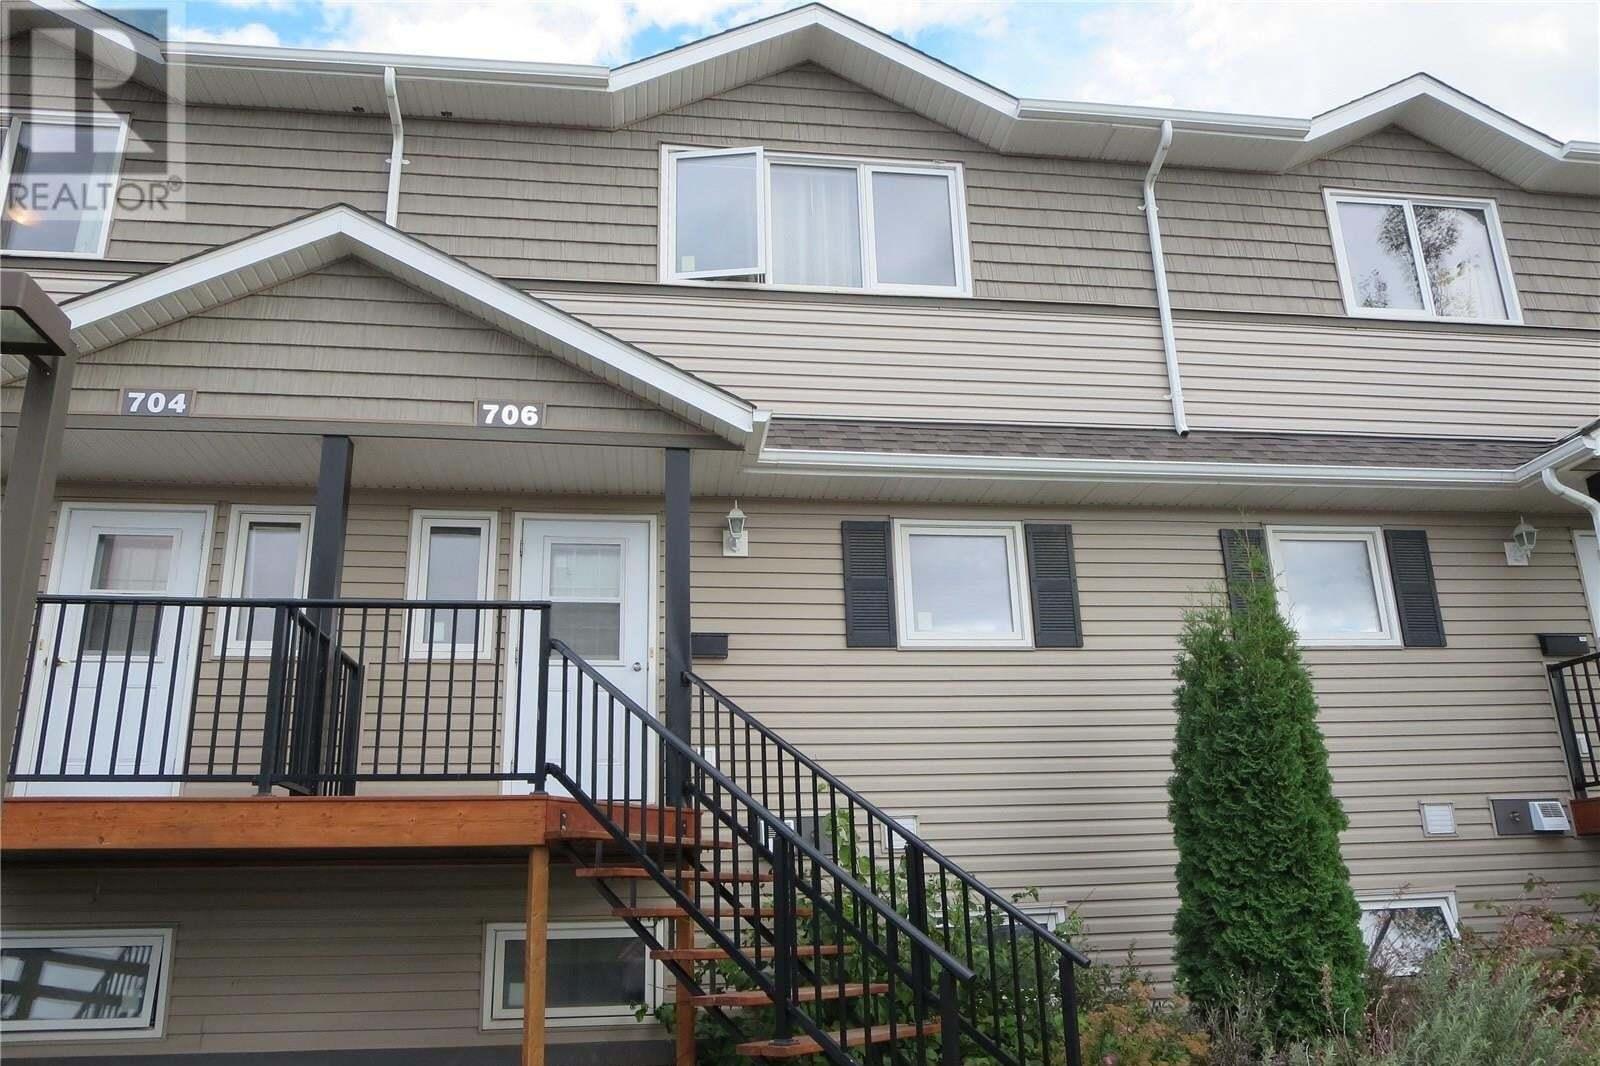 Townhouse for sale at 1022 Hampton Cir Unit 706 Saskatoon Saskatchewan - MLS: SK825820